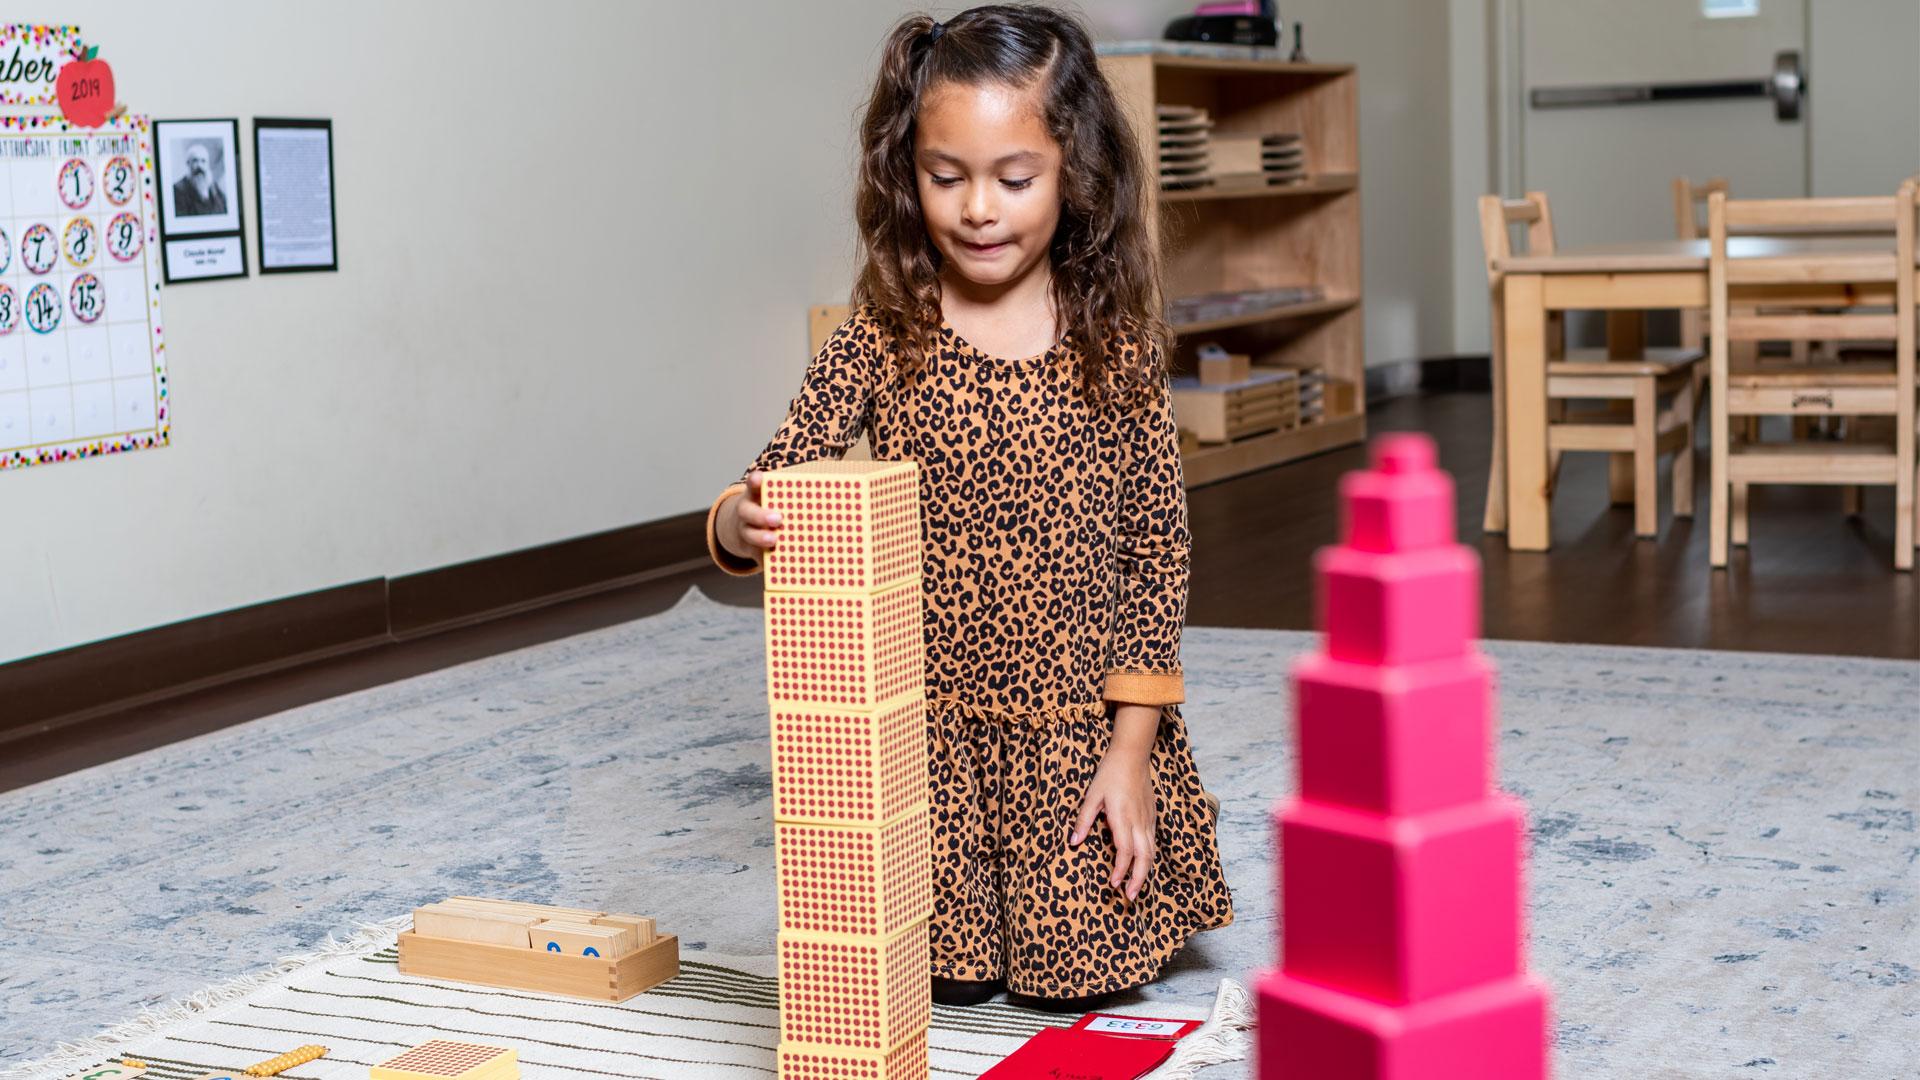 A little girl playing wooden blocks